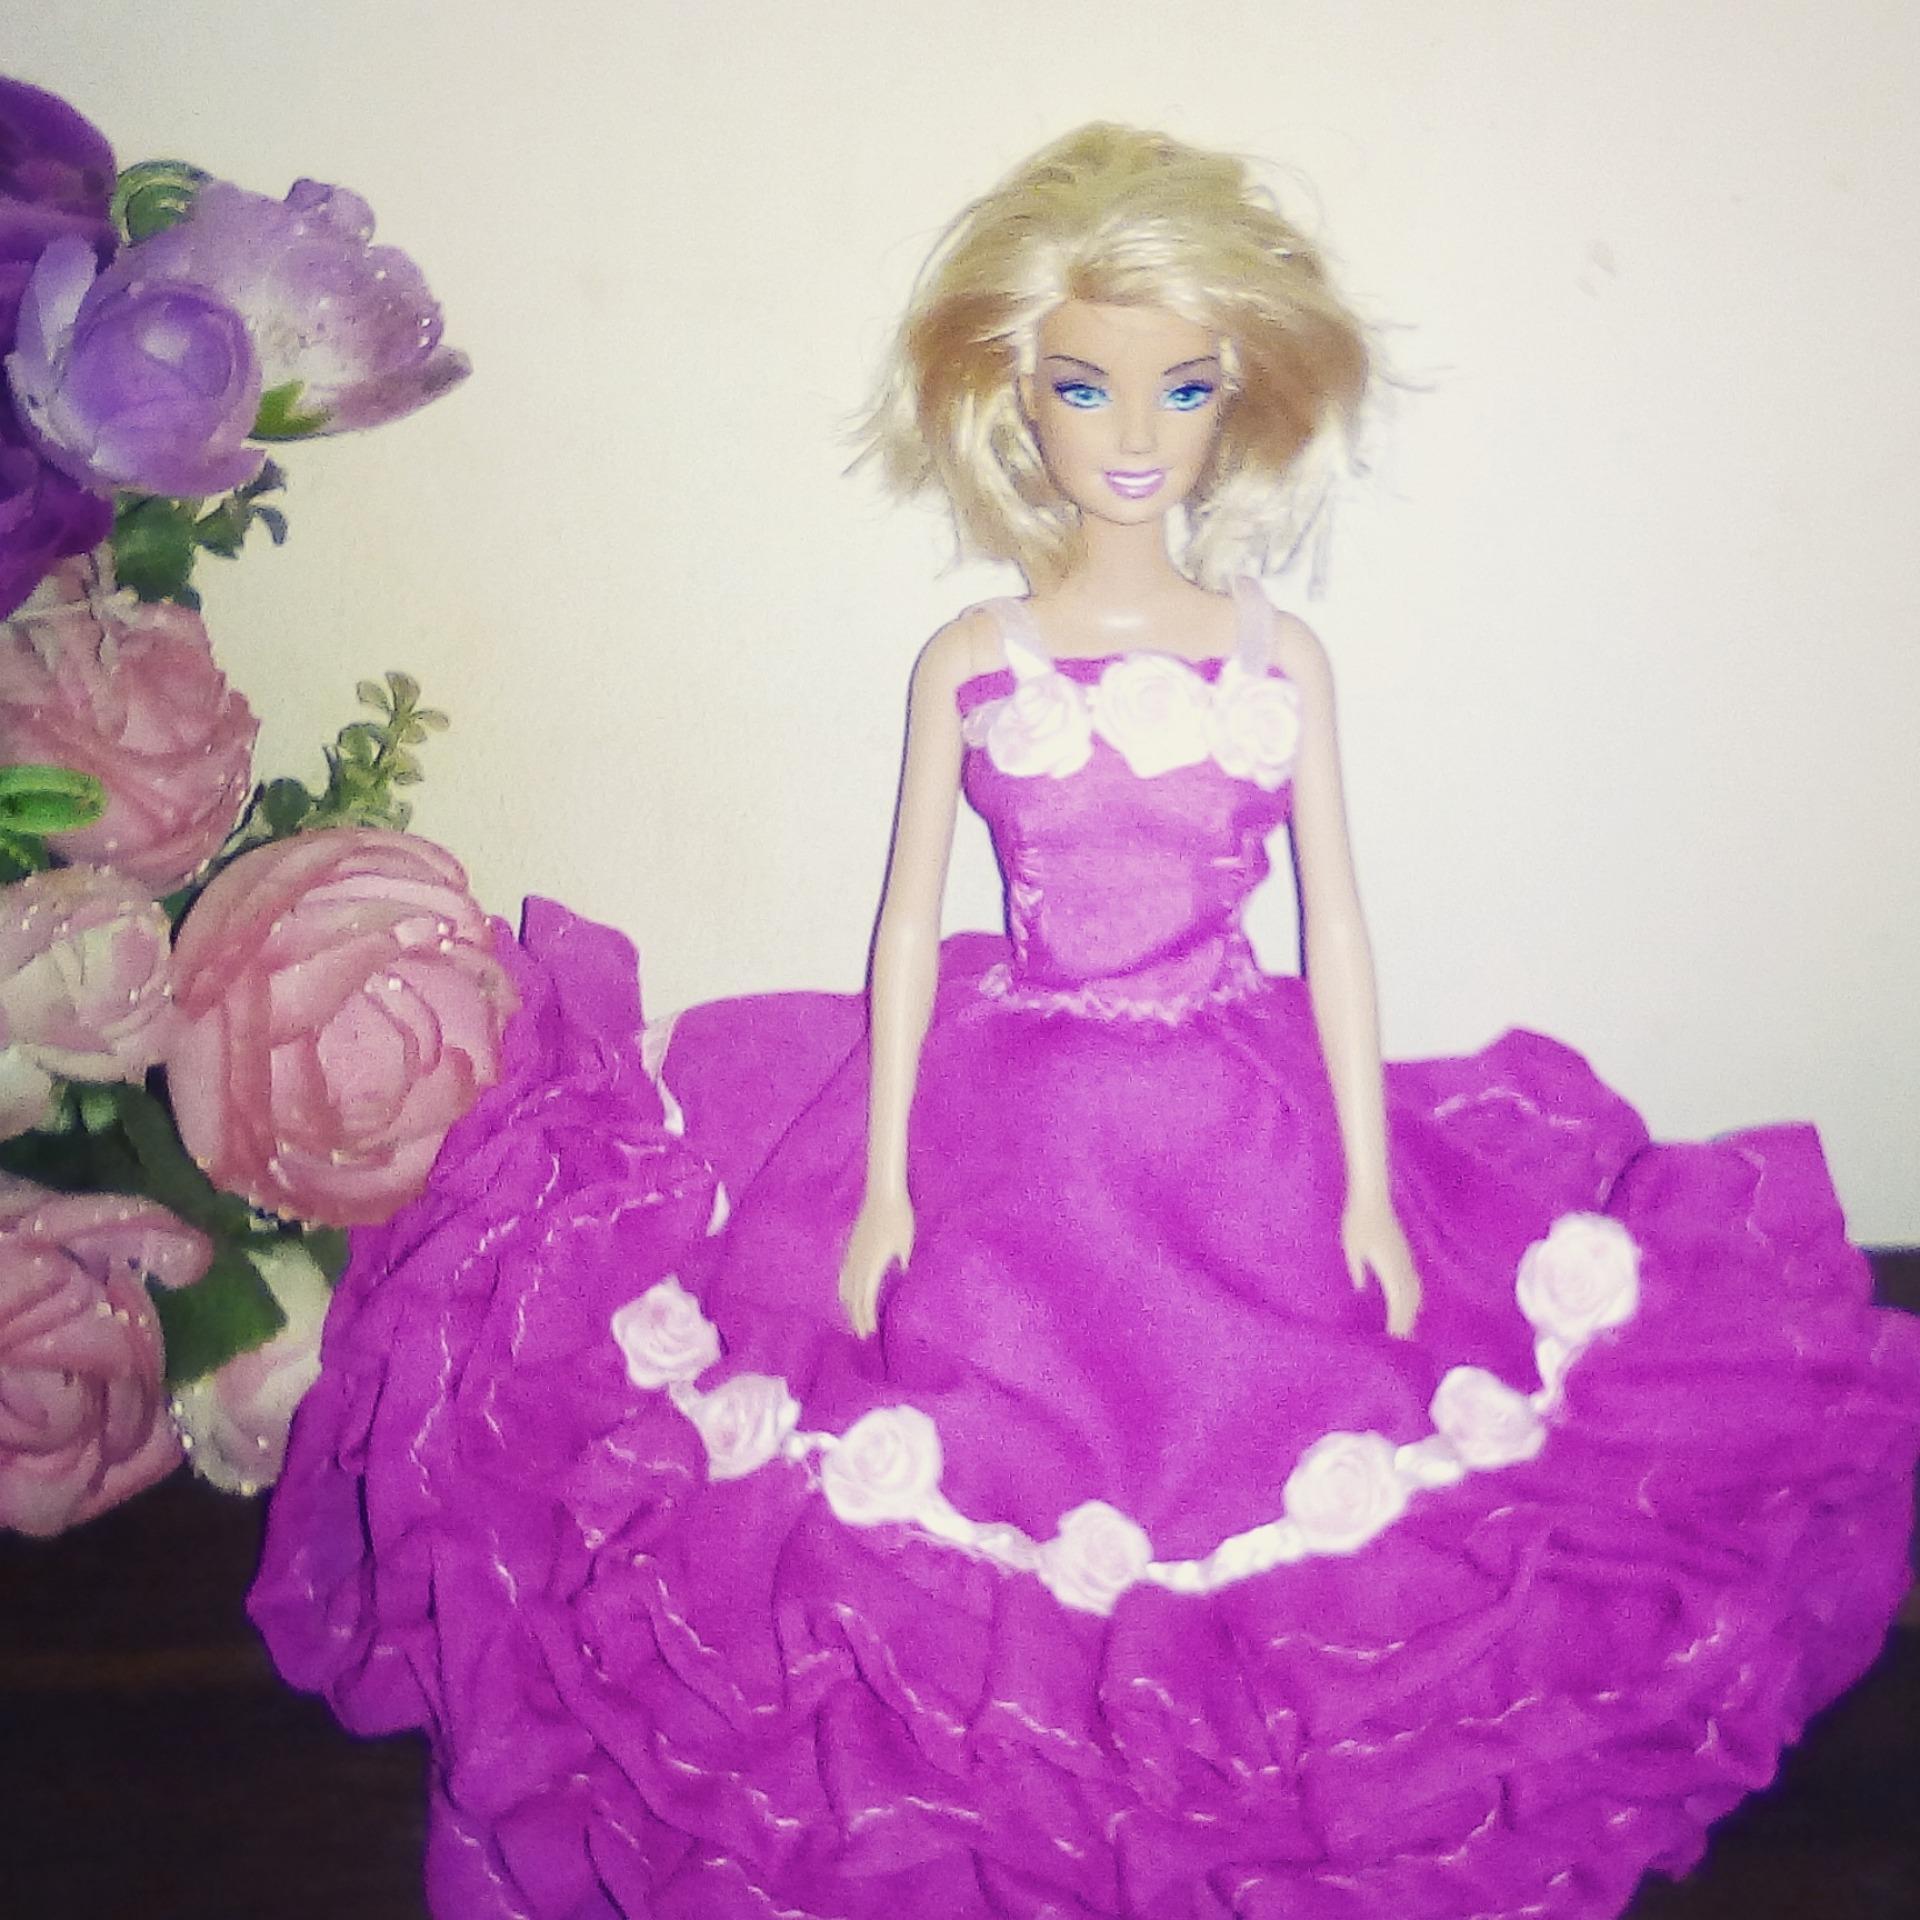 jual baju barbie princess buatan tangan